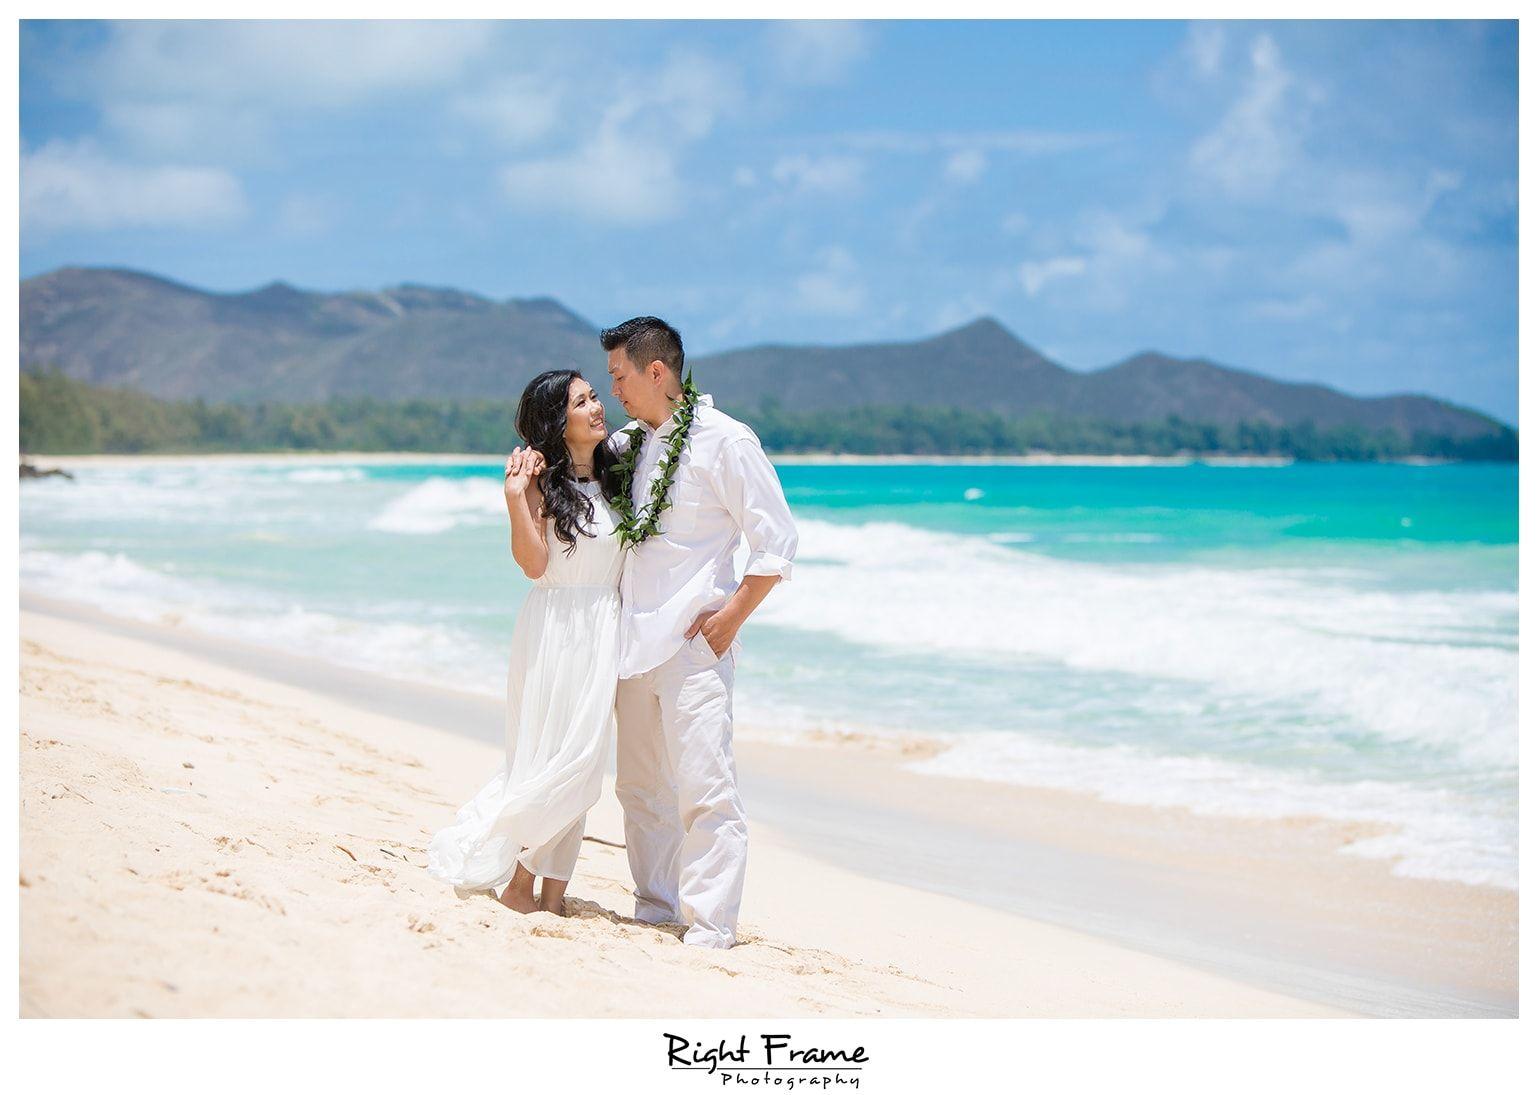 Beach Wedding Ceremony Oahu: Beautiful Destination Wedding Vow